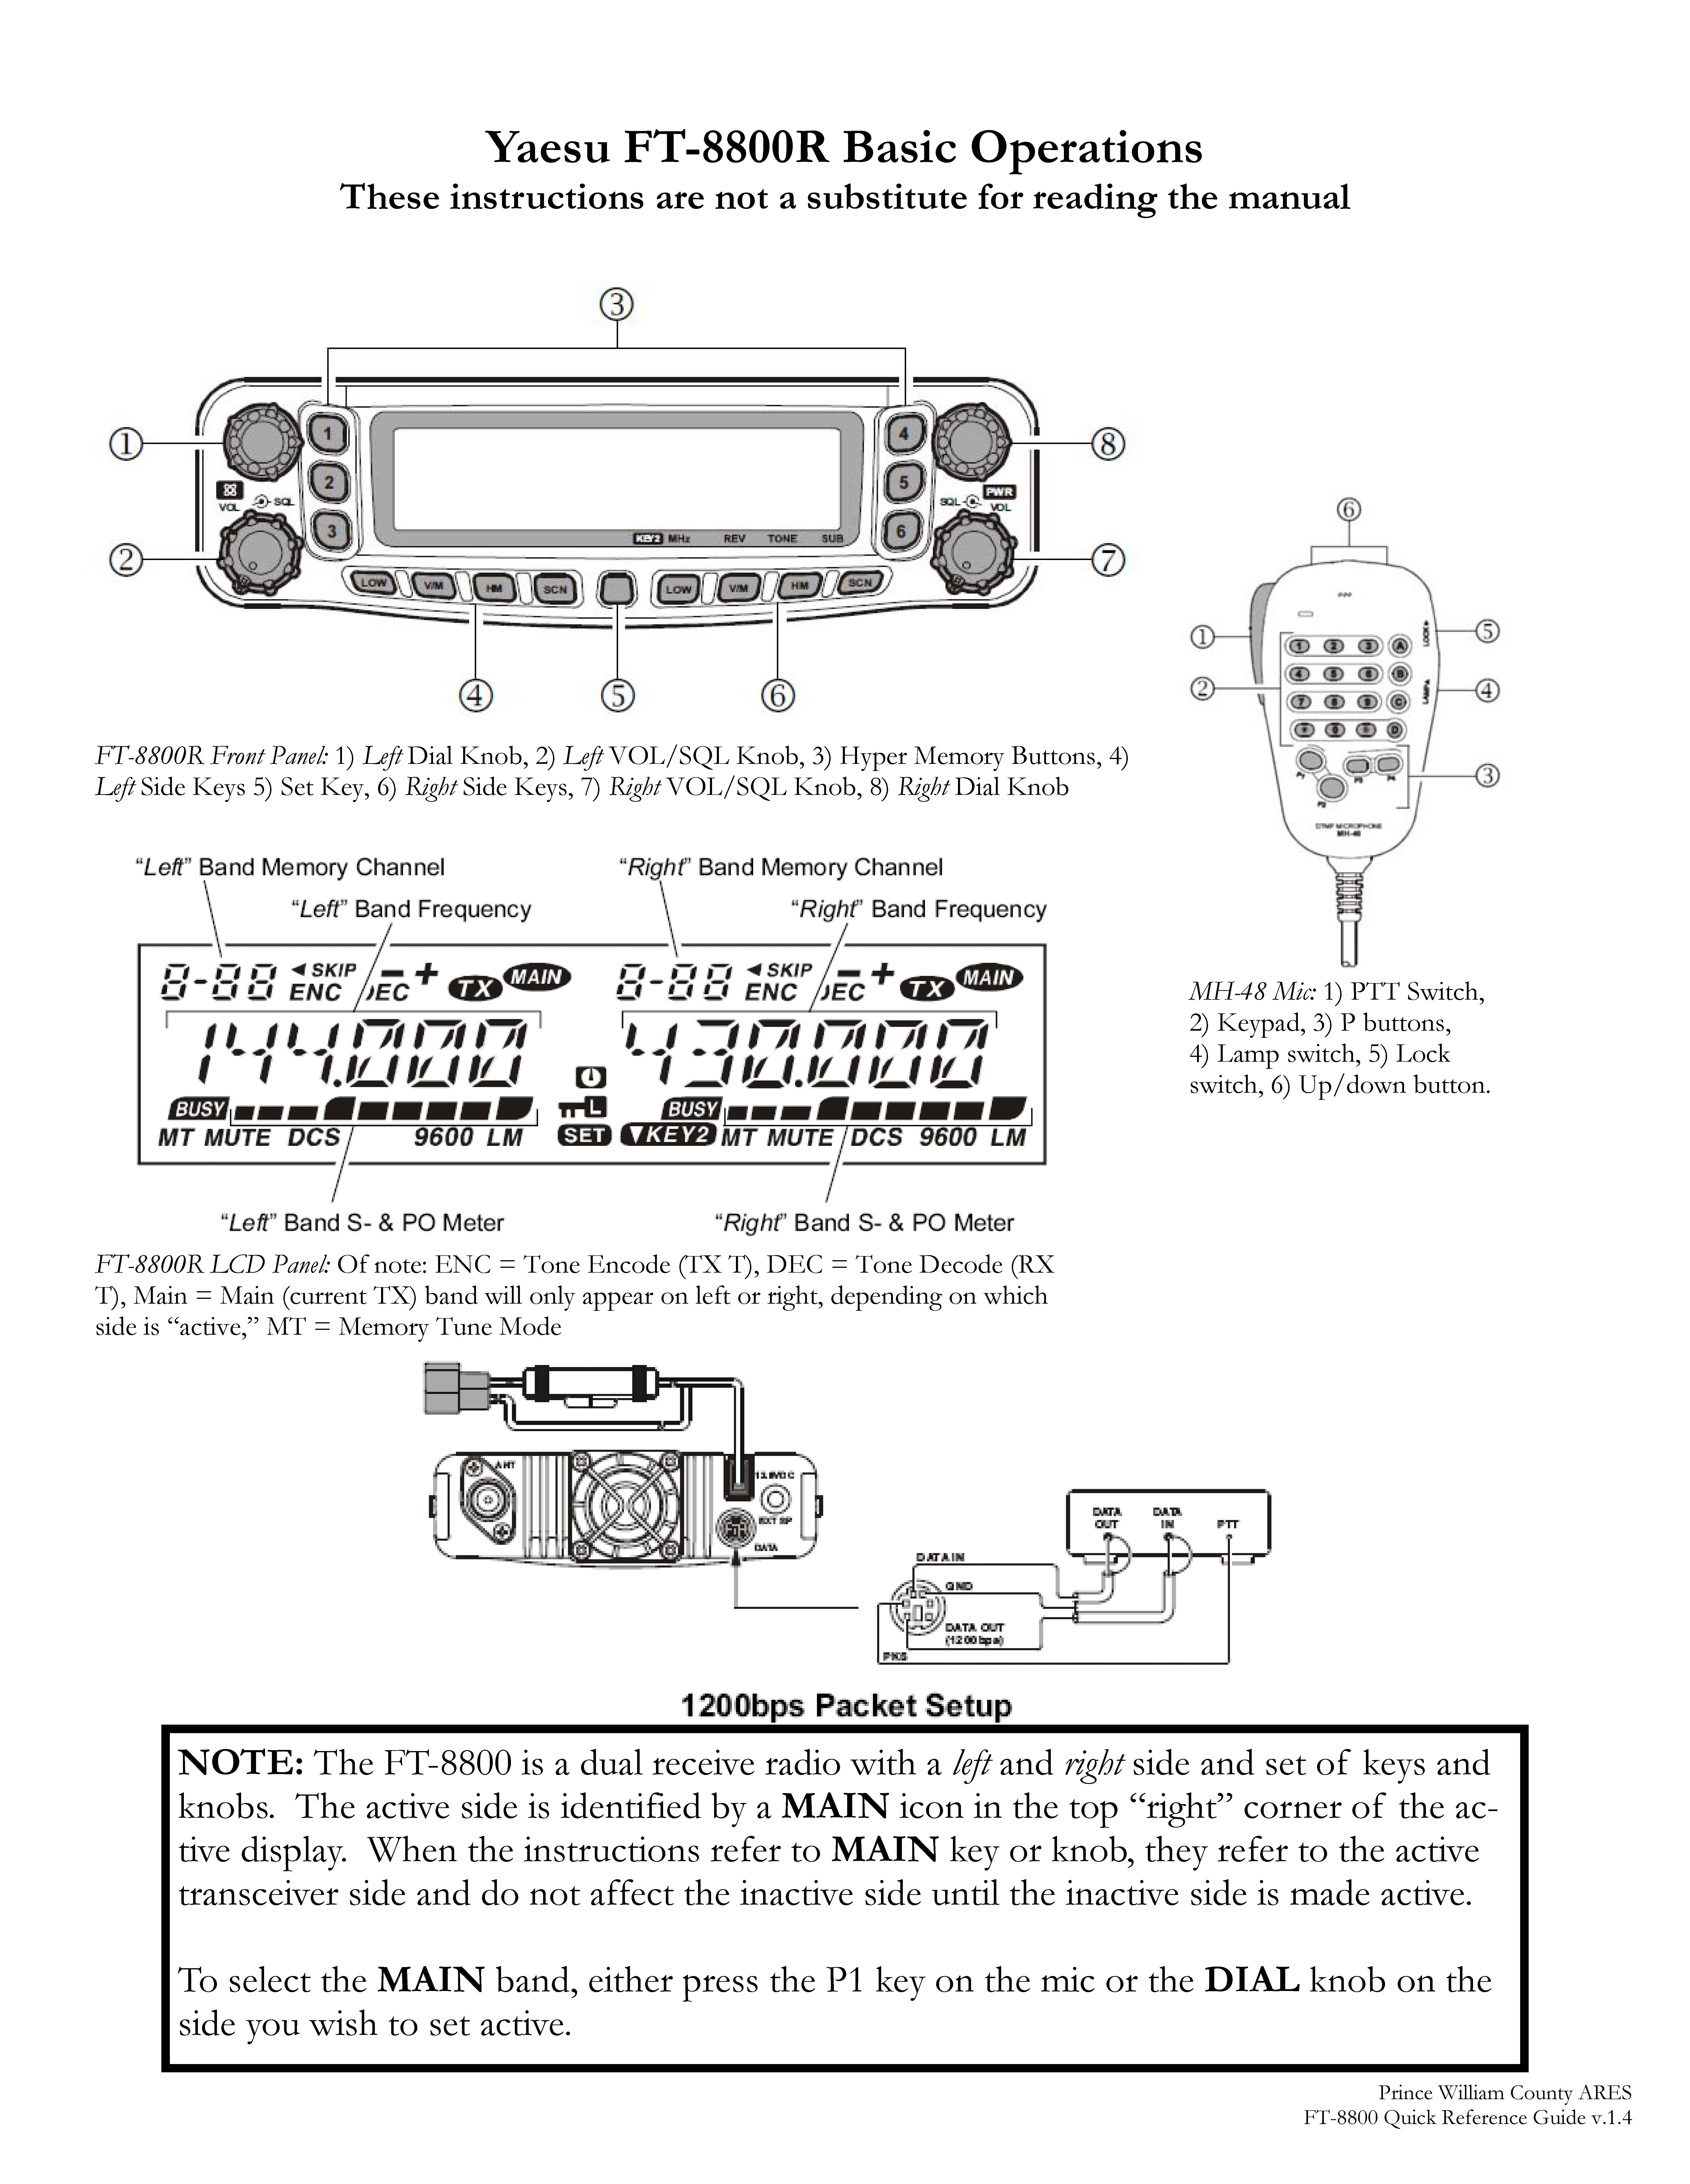 FT-8800 QRC Page 1